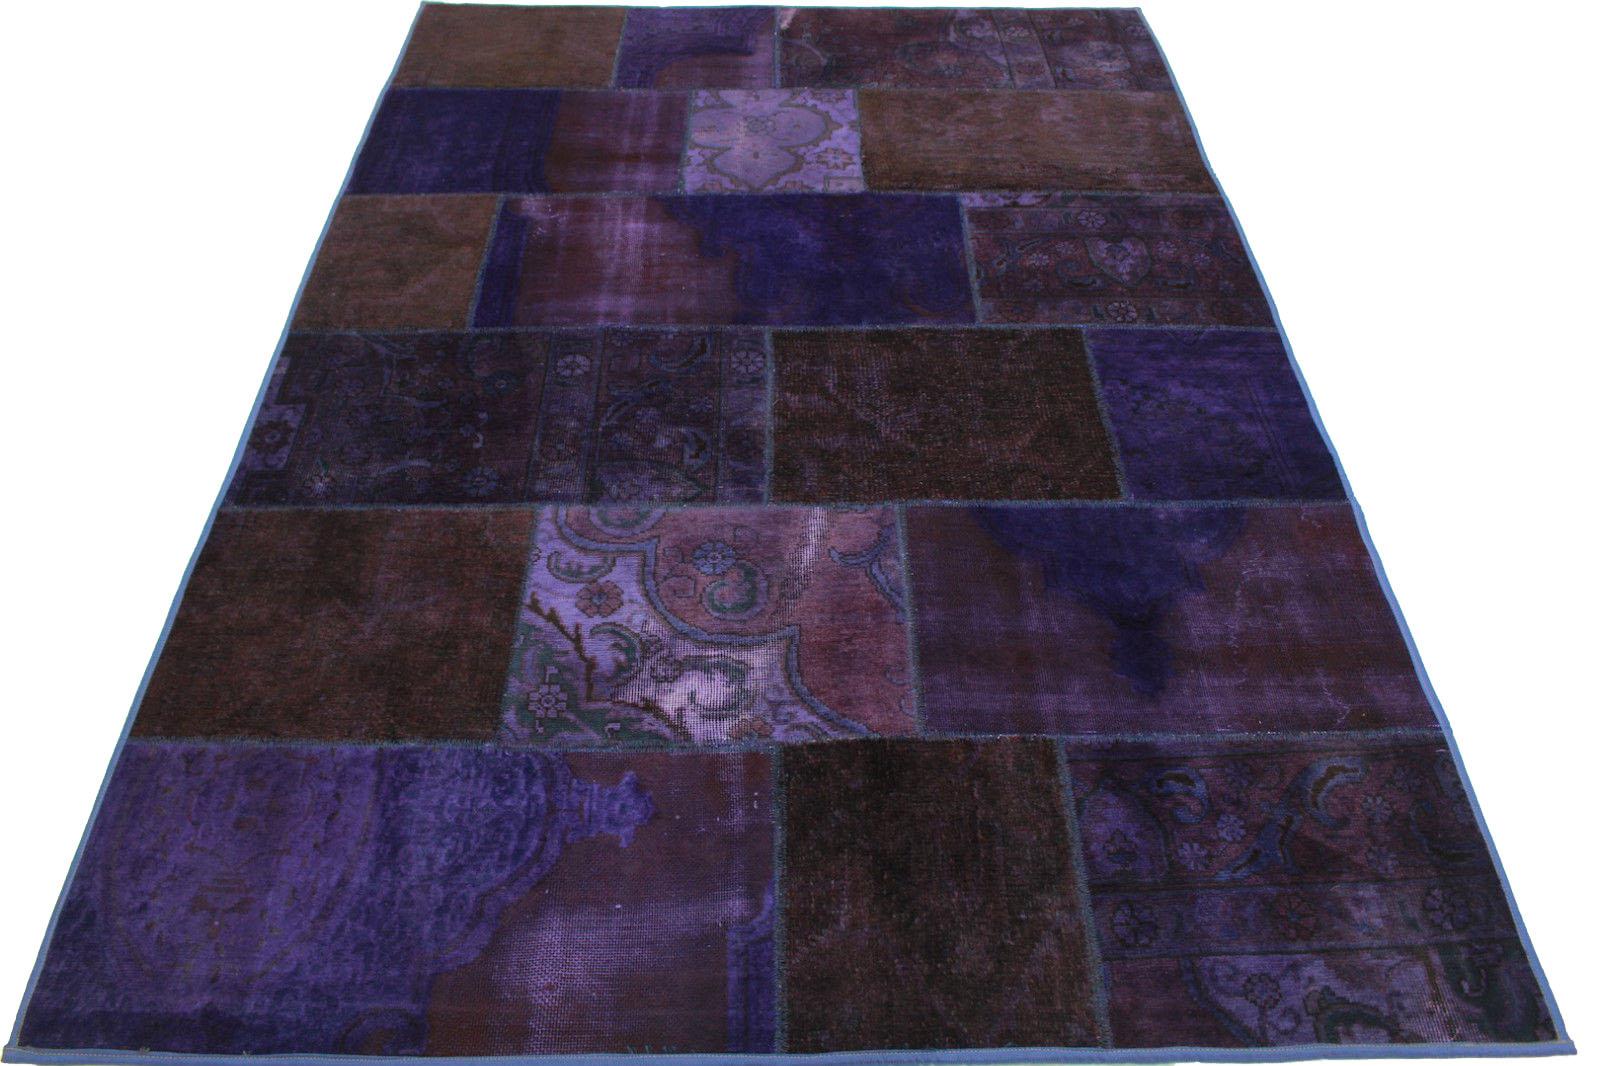 patchwork teppich lila in 250x170cm 1001 921 bei kaufen. Black Bedroom Furniture Sets. Home Design Ideas